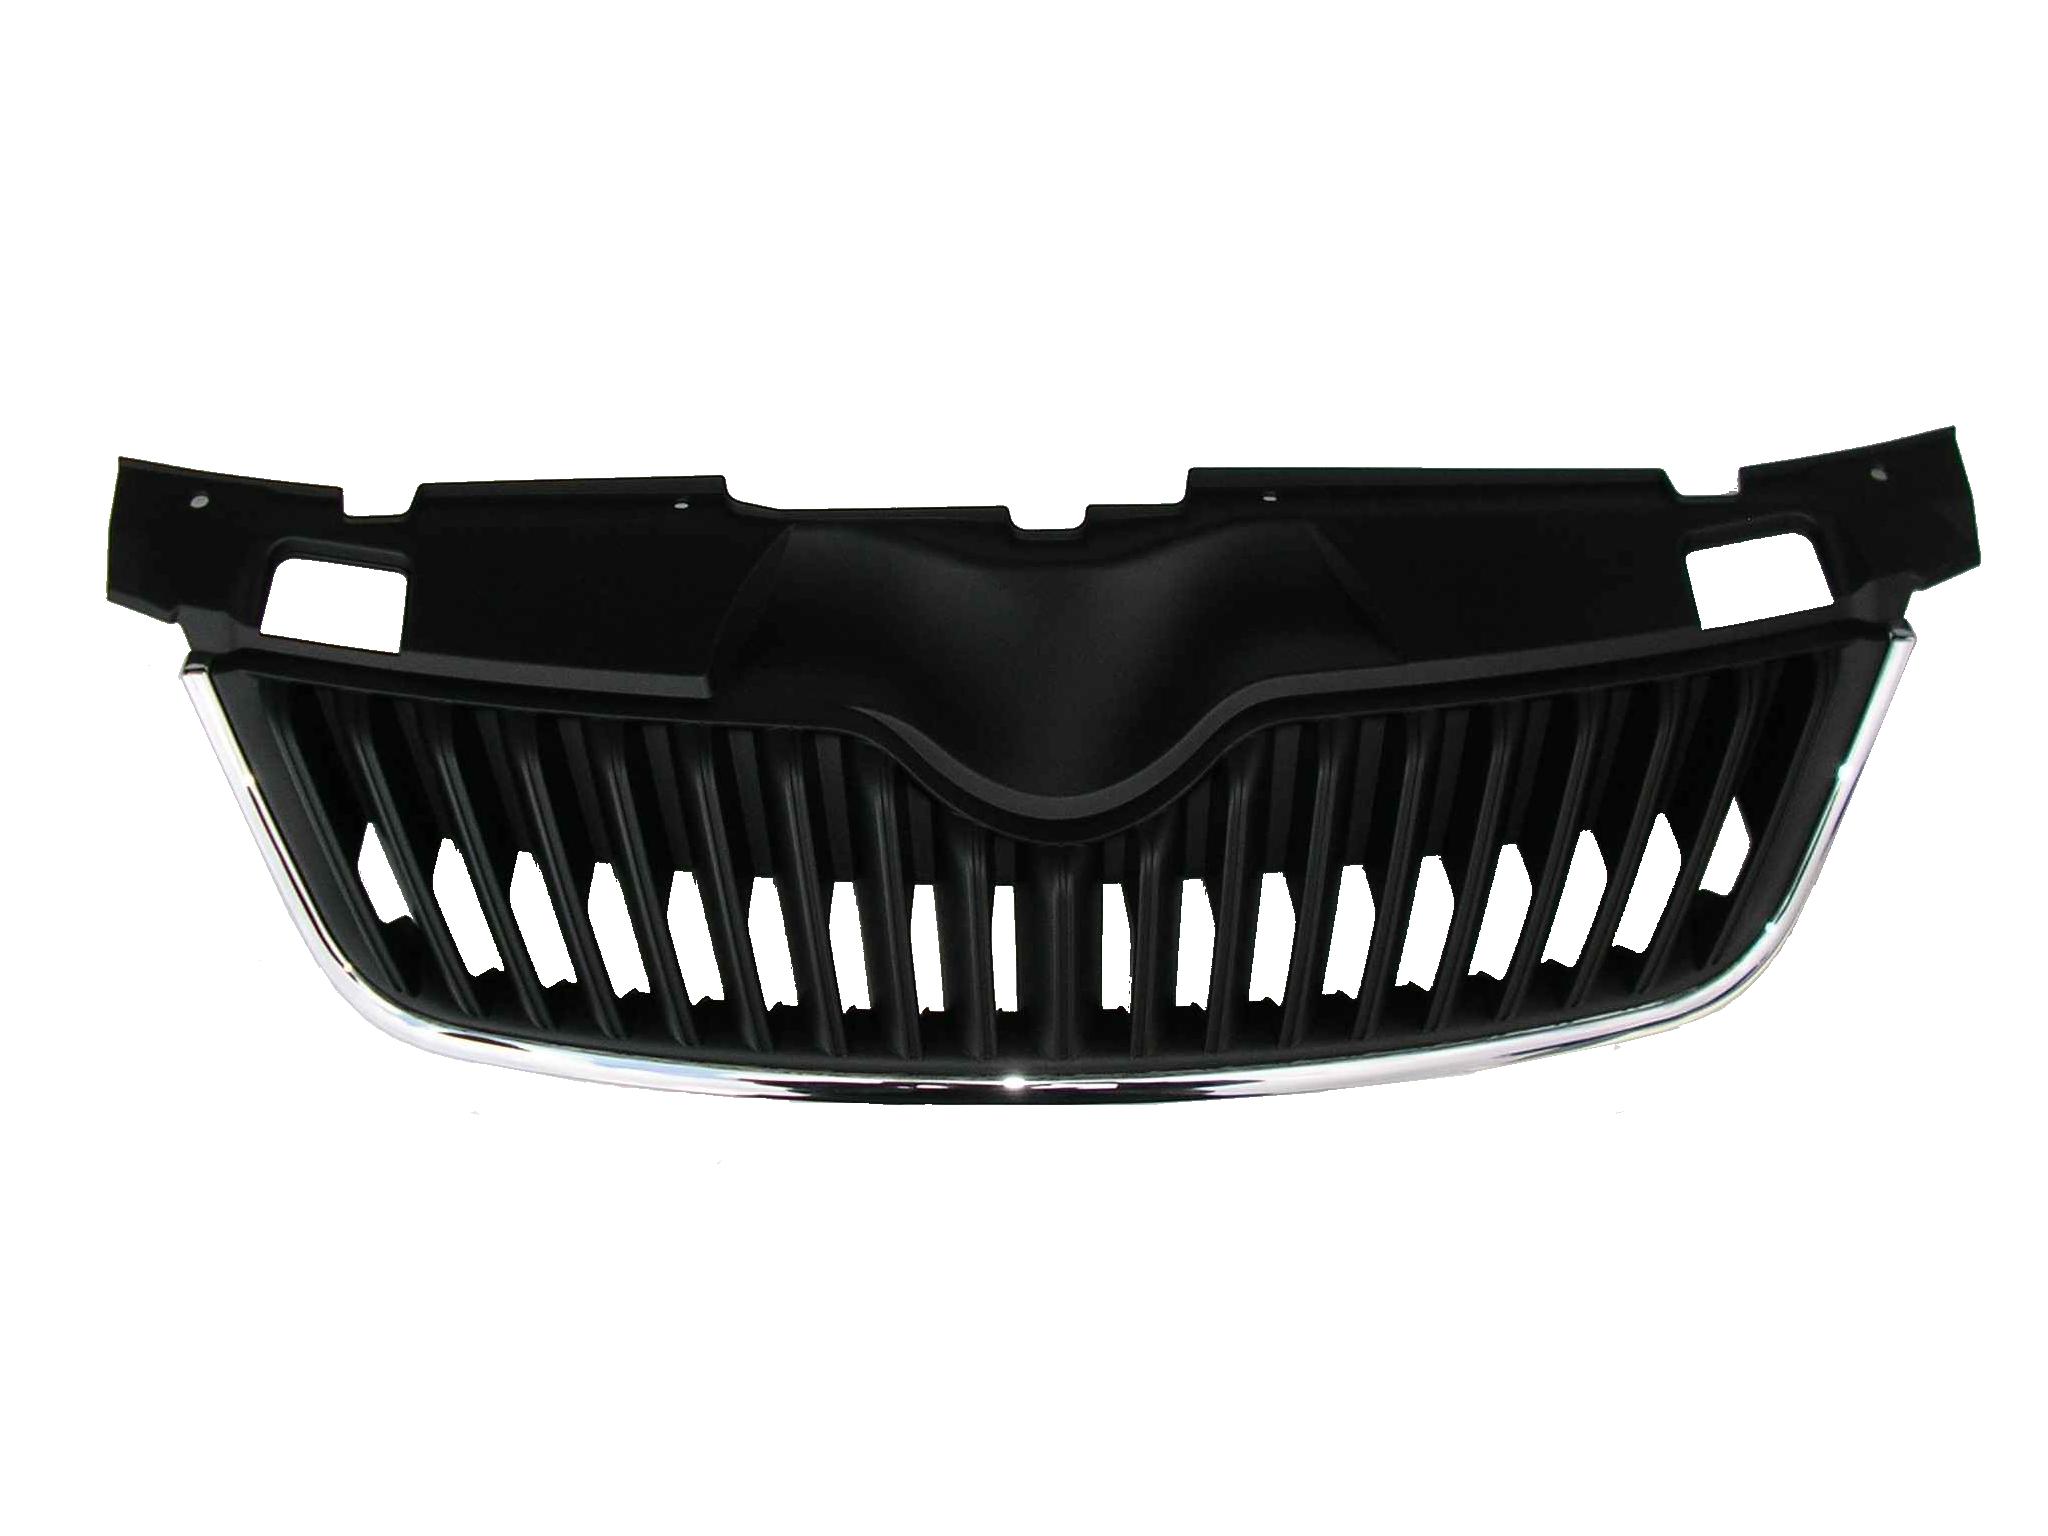 Maska chladiče mřížka FABIA II chromová 5J0853668C